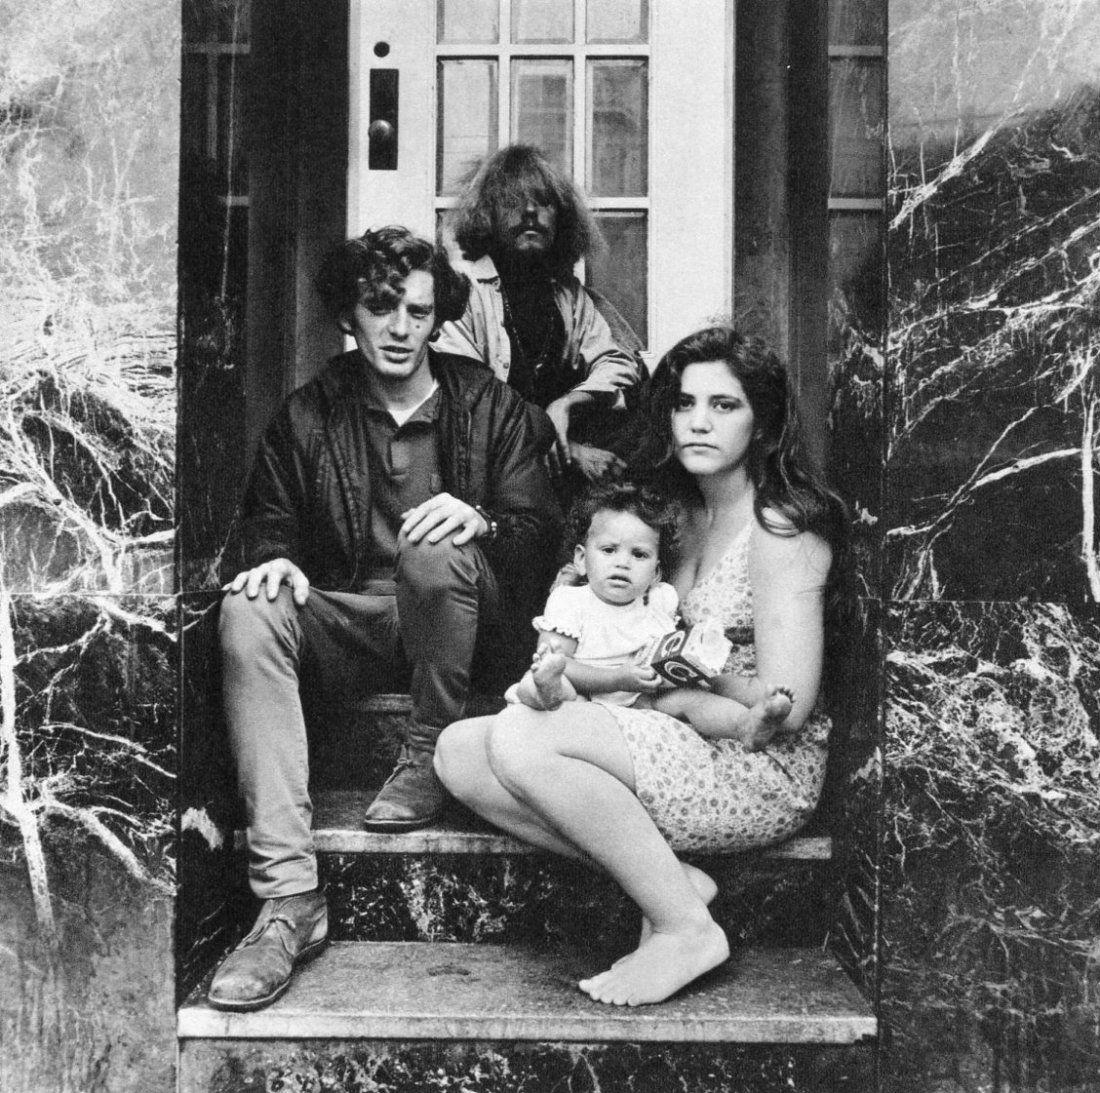 Elaine mays haight street 1970 gravure jan 16 2015